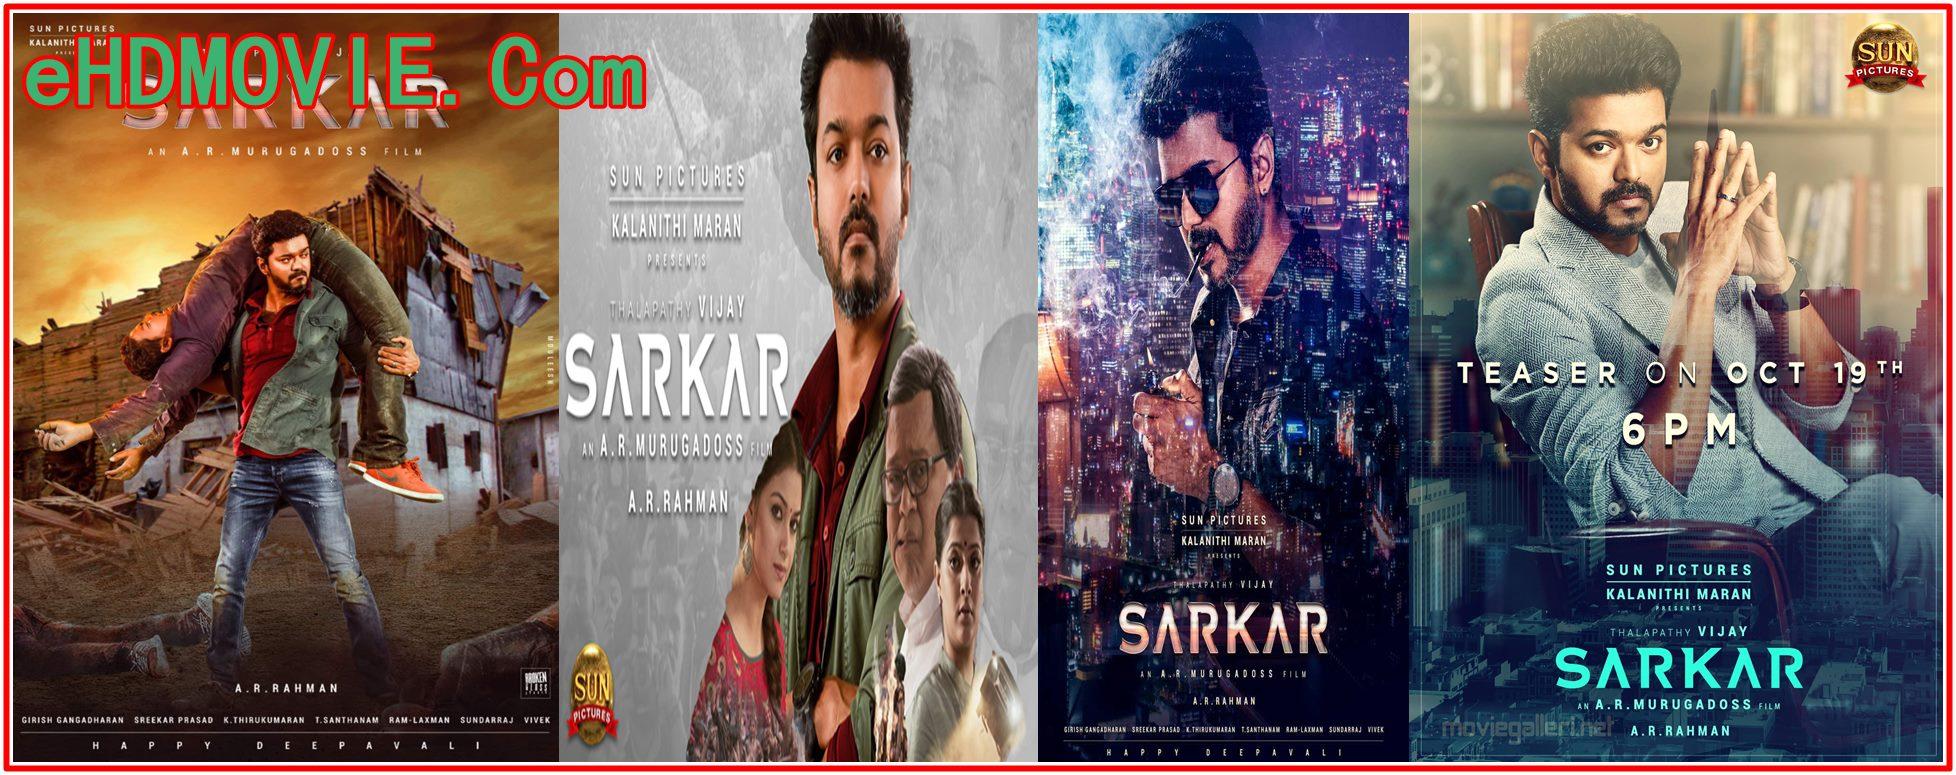 Sarkar 2018 Full Movie Tamil 720p – 480p ORG HD-Rip 400MB – 1.4GB ESubs Free Download